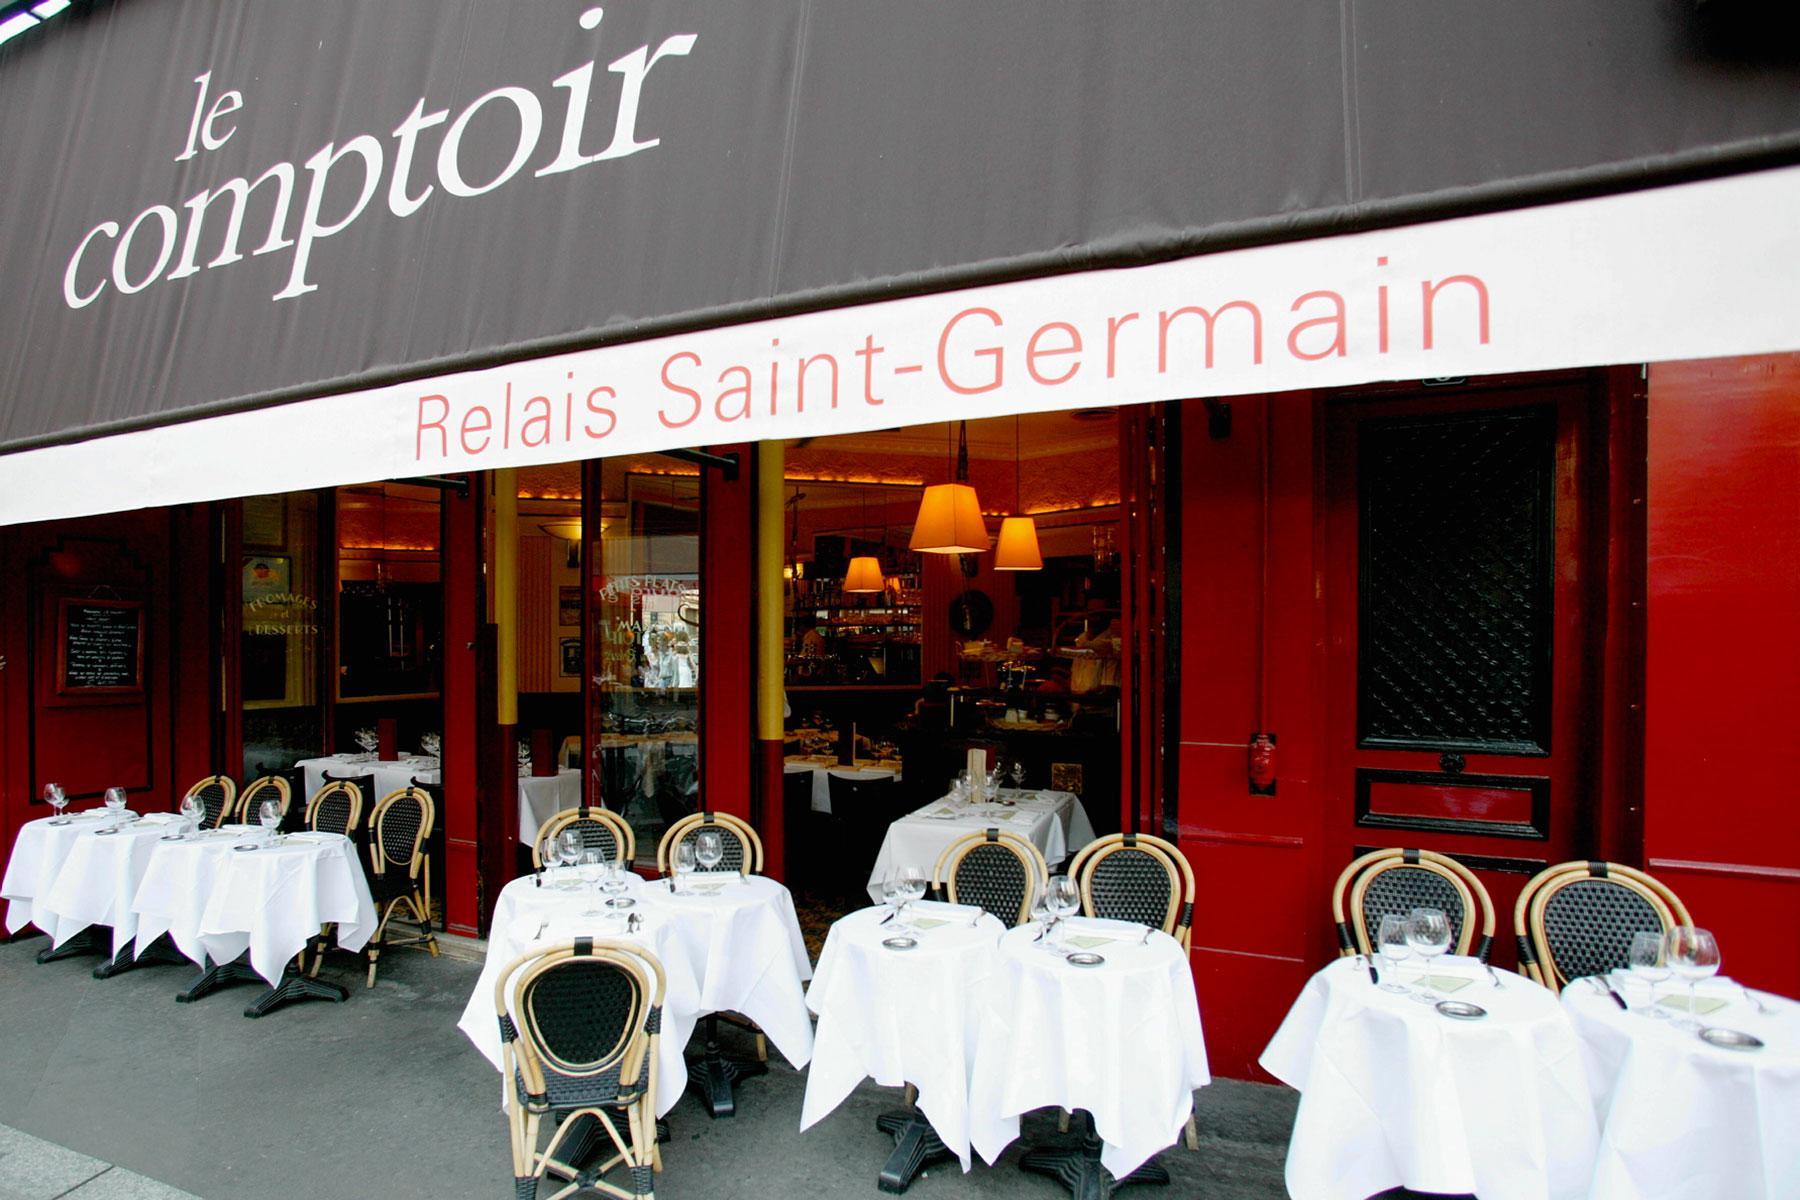 14 Classic Bistros in Paris Worth Visiting – Fodors Travel Guide